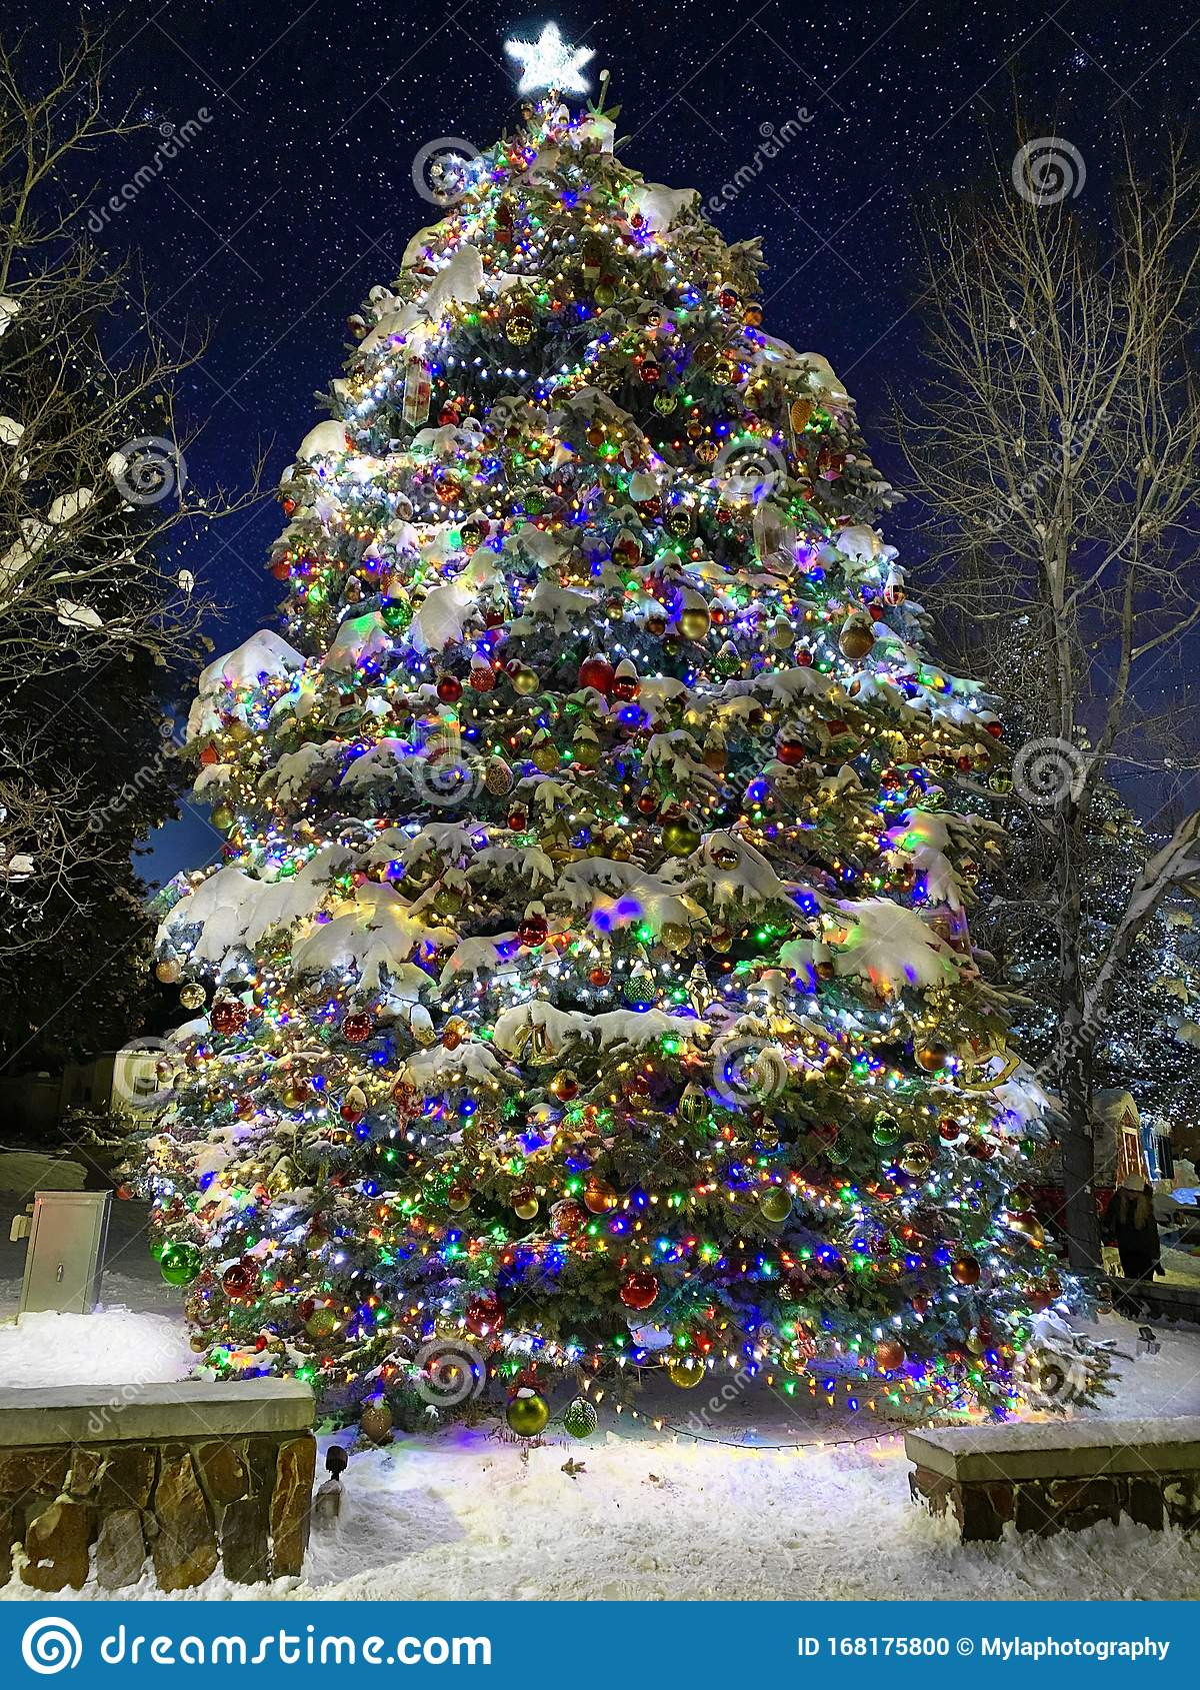 Tall Christmas Tree In Big Bear. Stock Photo - Image of ...